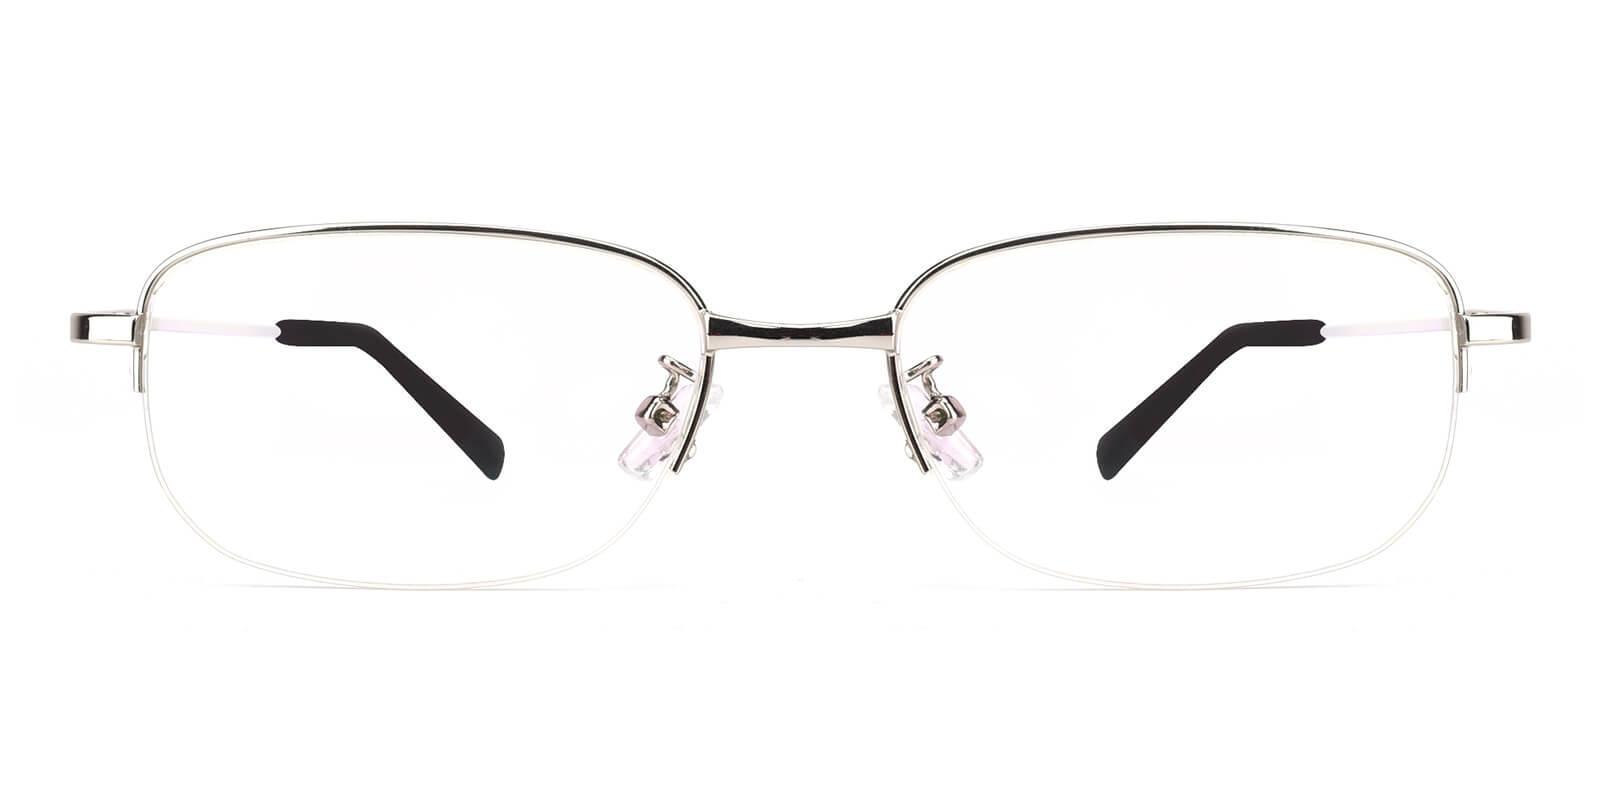 Joplin-Silver-Rectangle-Metal-Eyeglasses-additional2